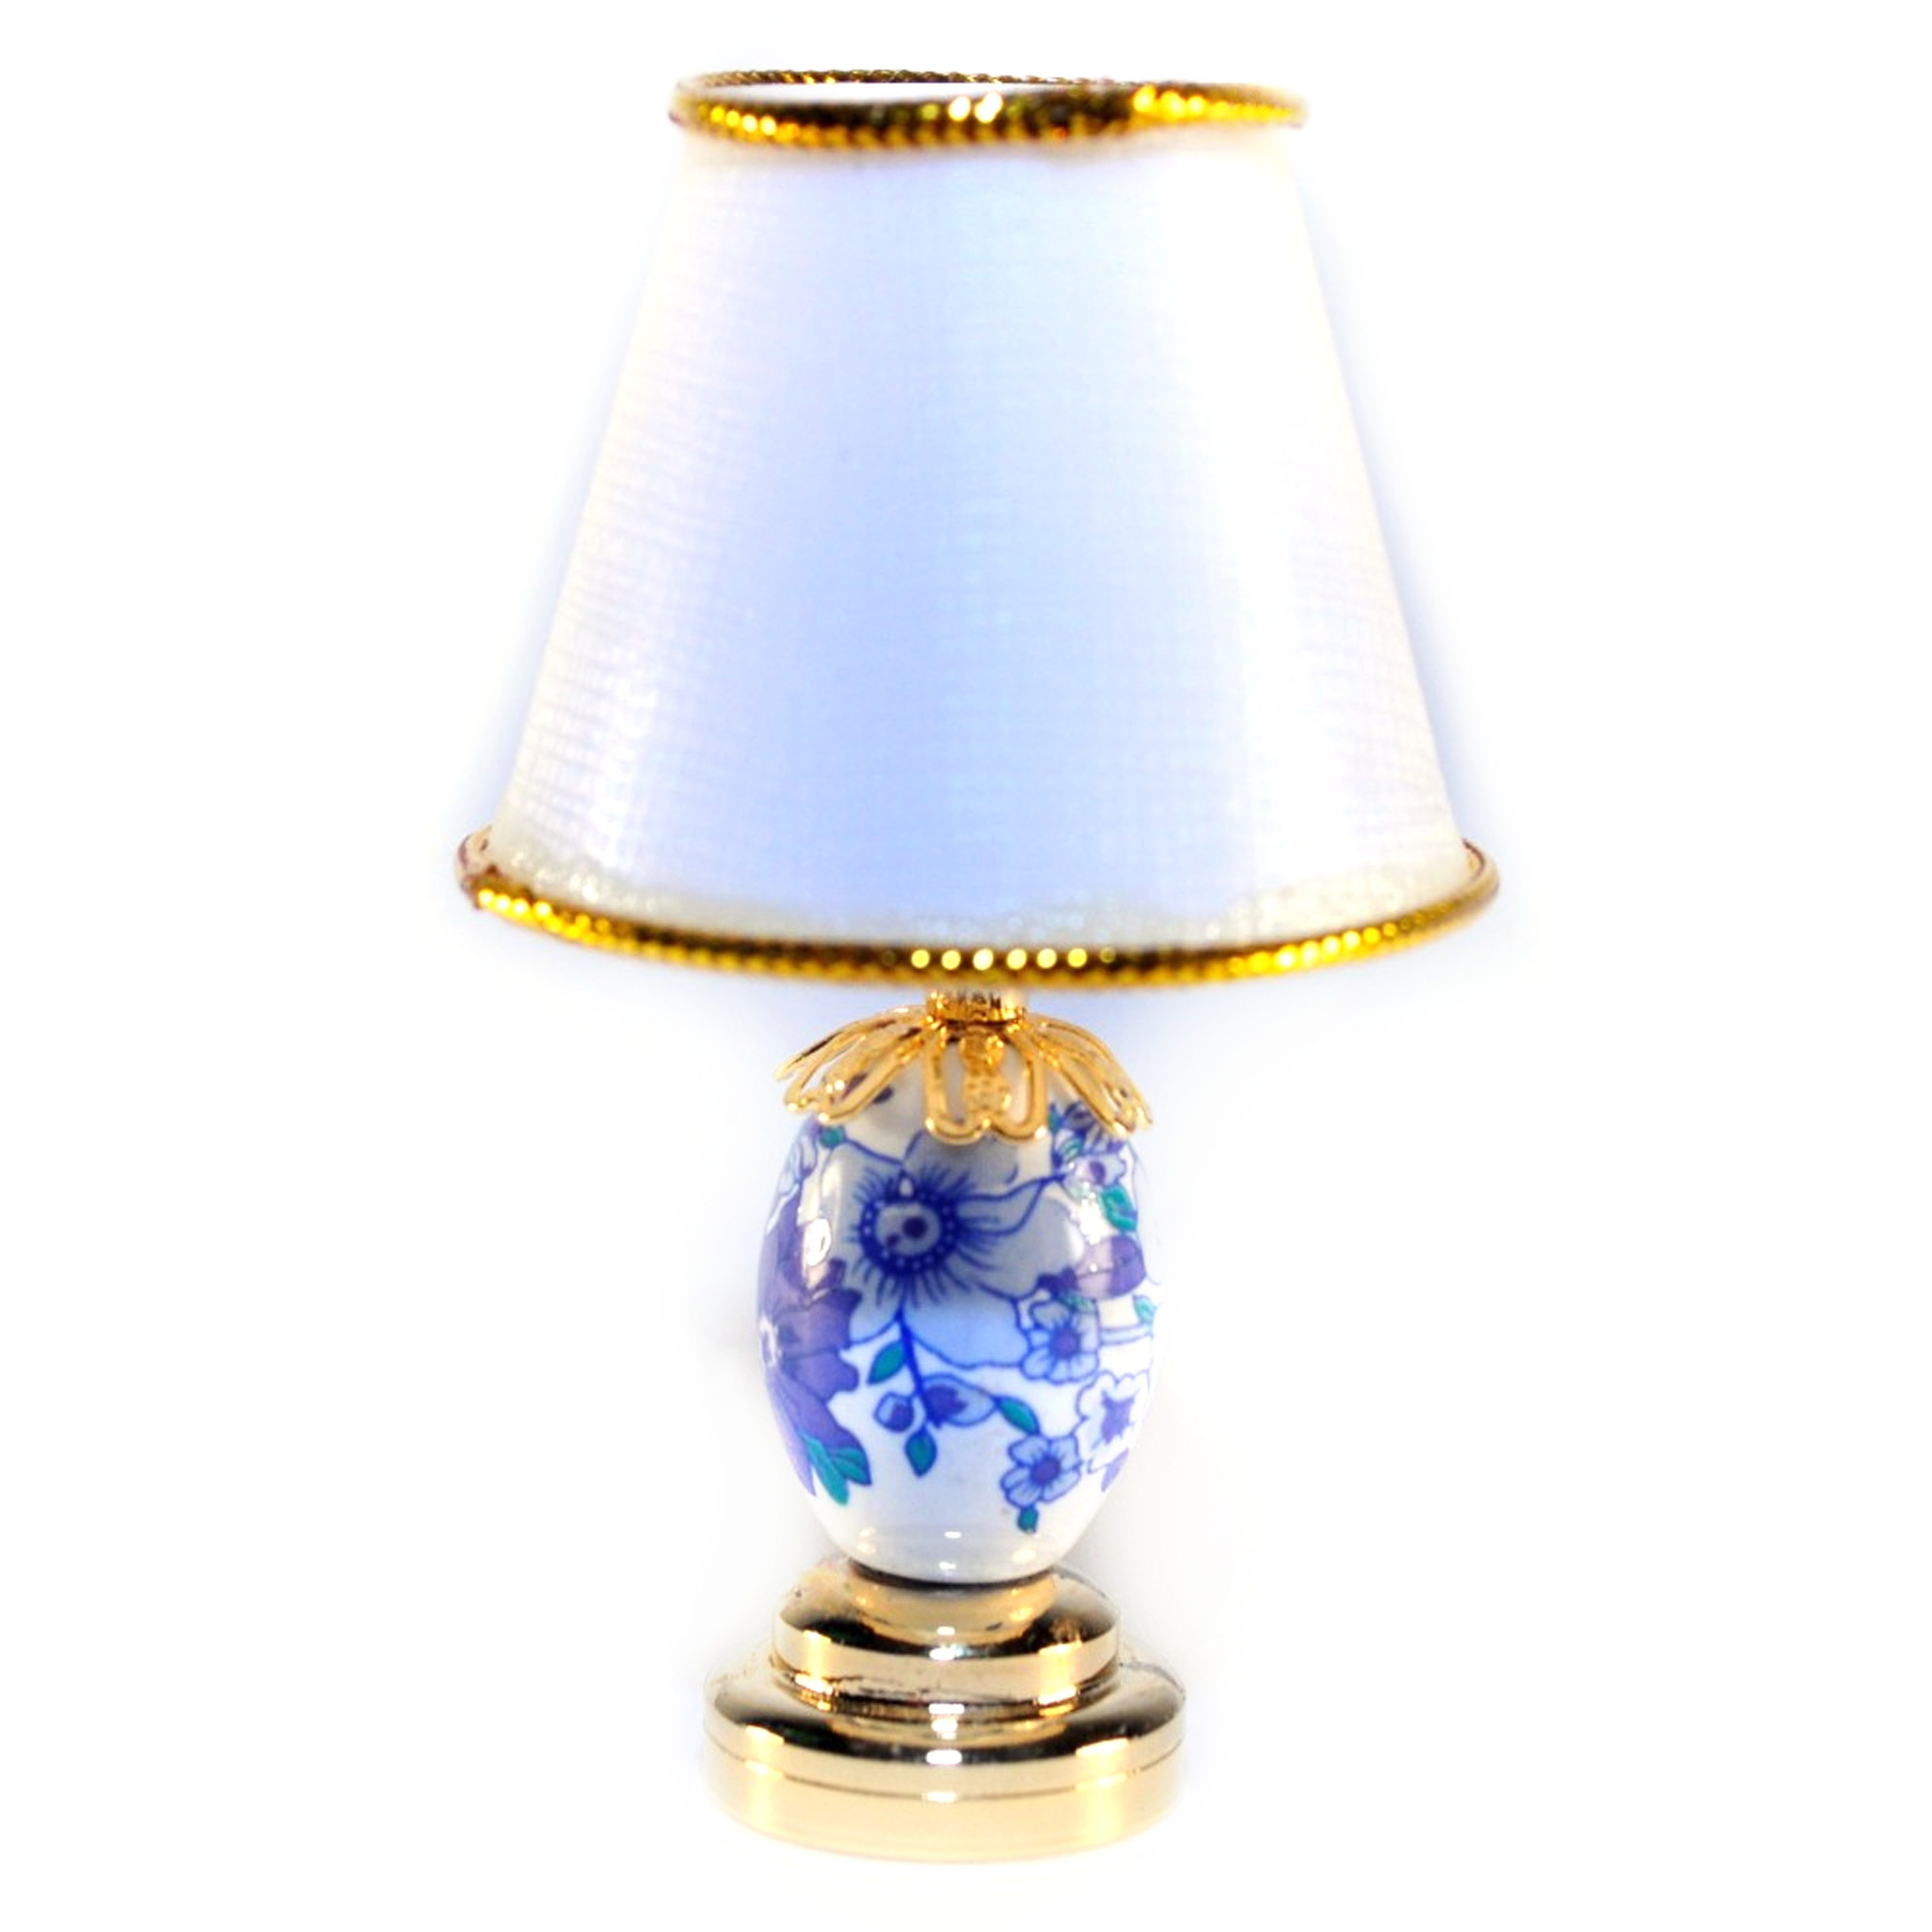 1:12 Scale 12cm Single Garden Lantern Coach LED Light Dolls House Lamp DE307